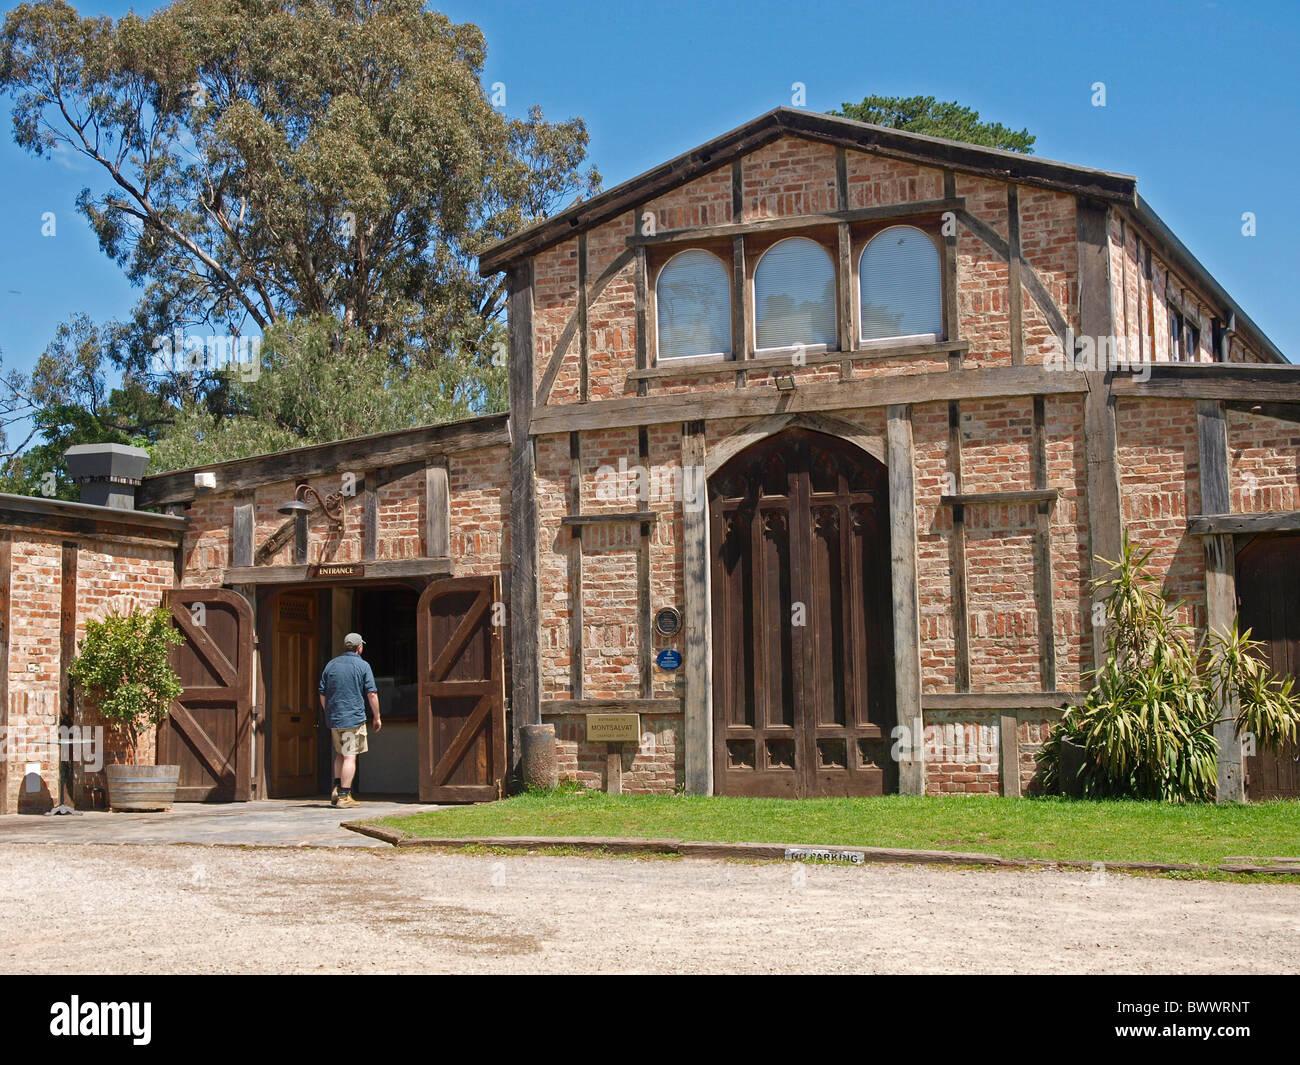 MAIN ENTRANCE AT MONTSALVAT , ARTIST COMMUNITY  VICTORIA  AUSTRALIA - Stock Image